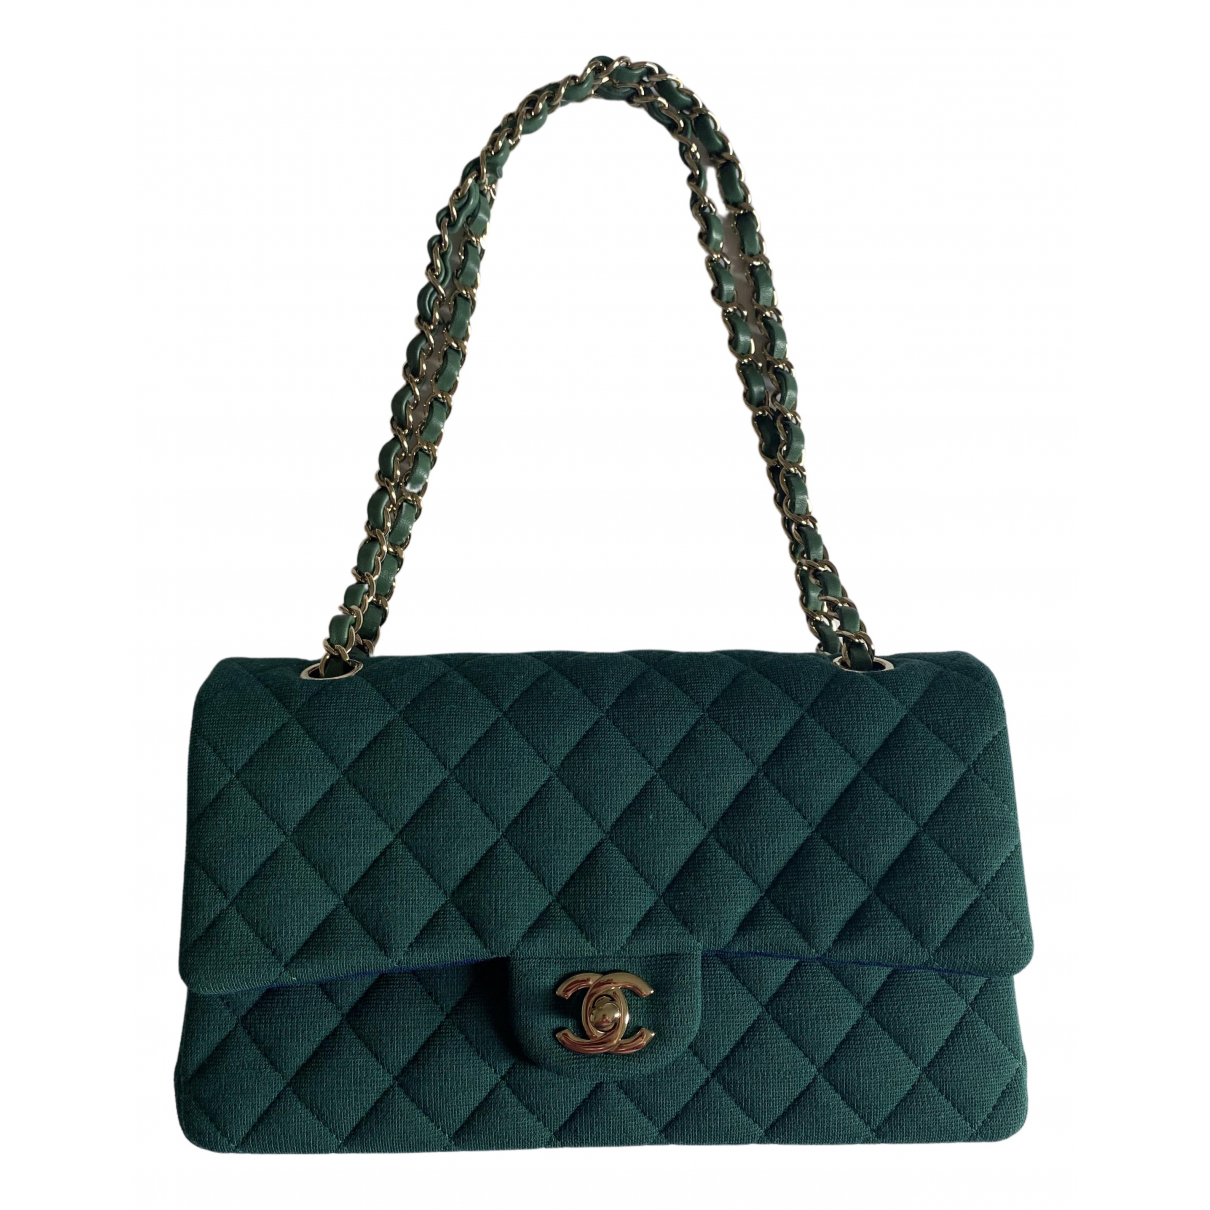 Chanel Timeless/Classique Handtasche in  Gruen Leinen